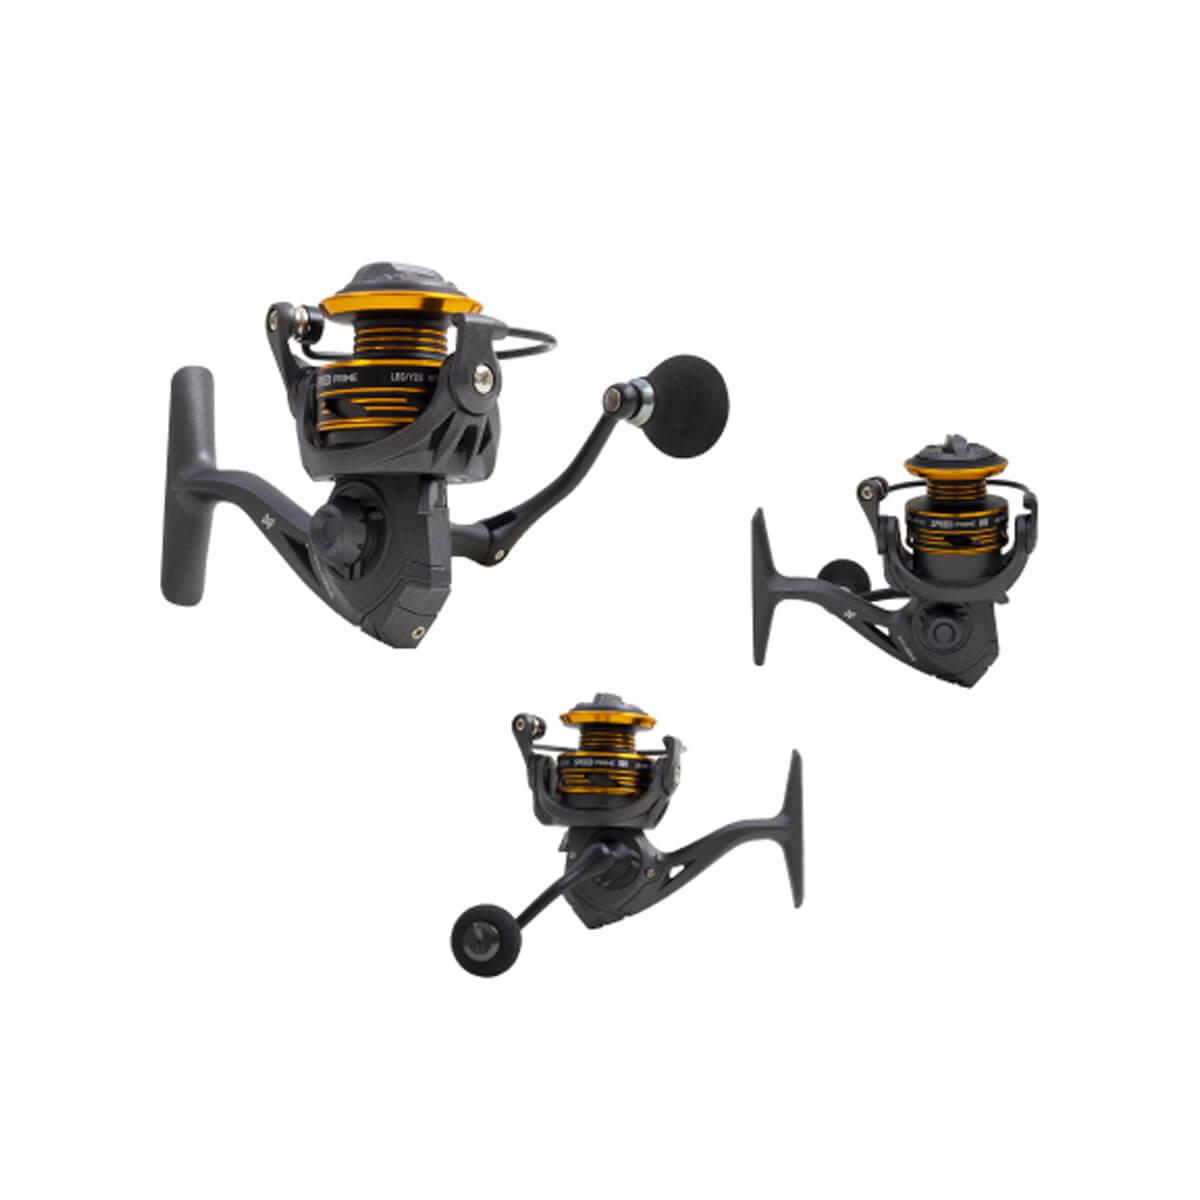 Molinete Albatroz Speed Prime 500  - Pró Pesca Shop